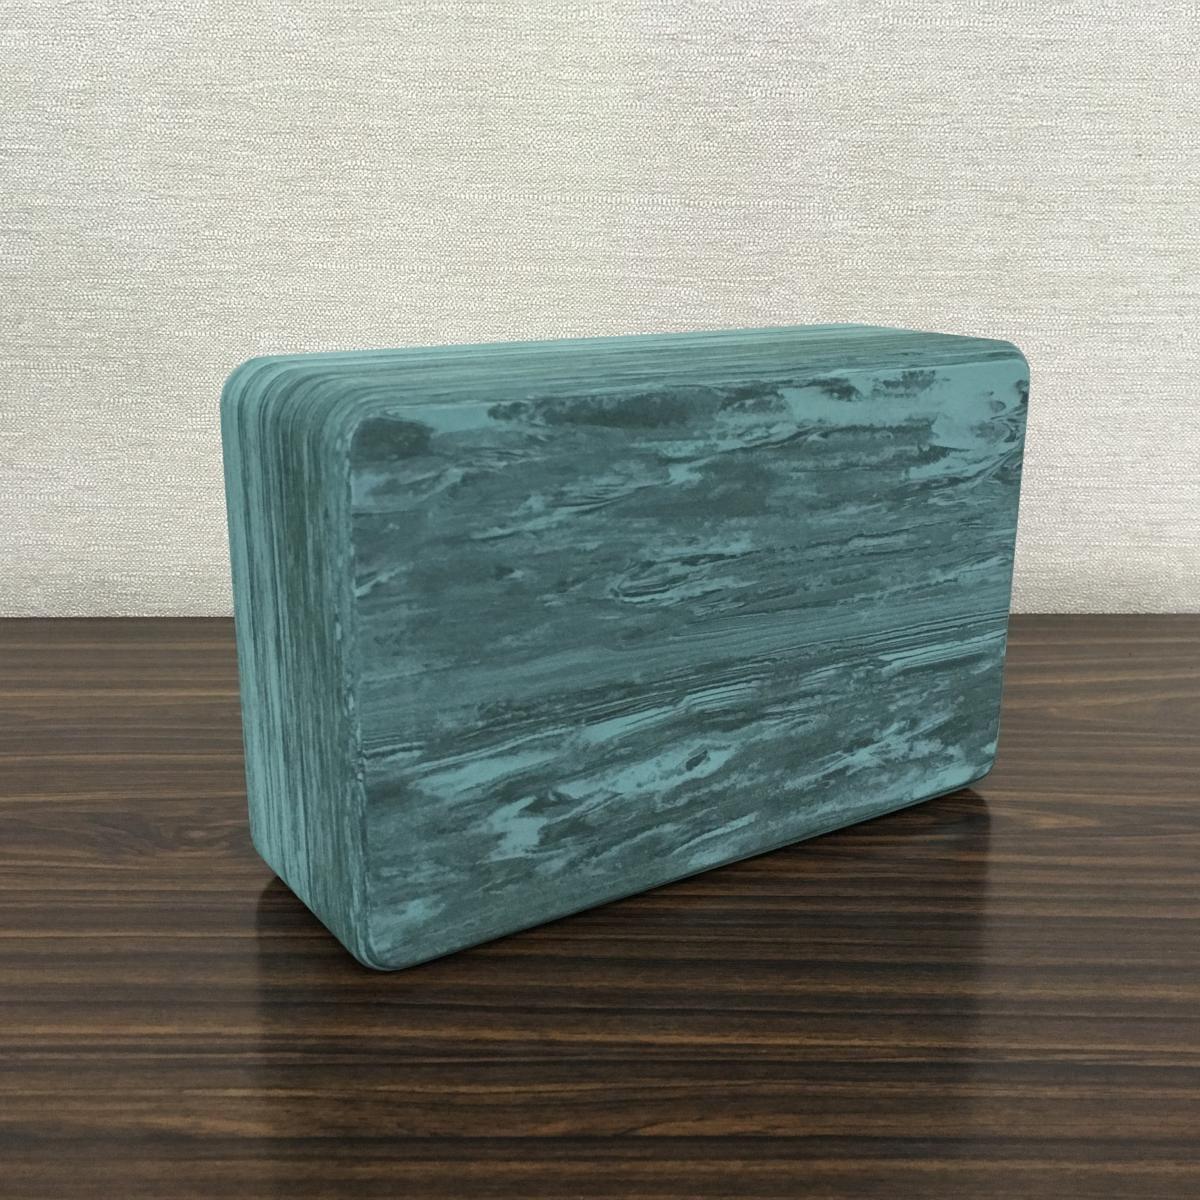 【QMAT】 40D瑜珈磚 混色系-青銅石紋、黑白雲彩 4